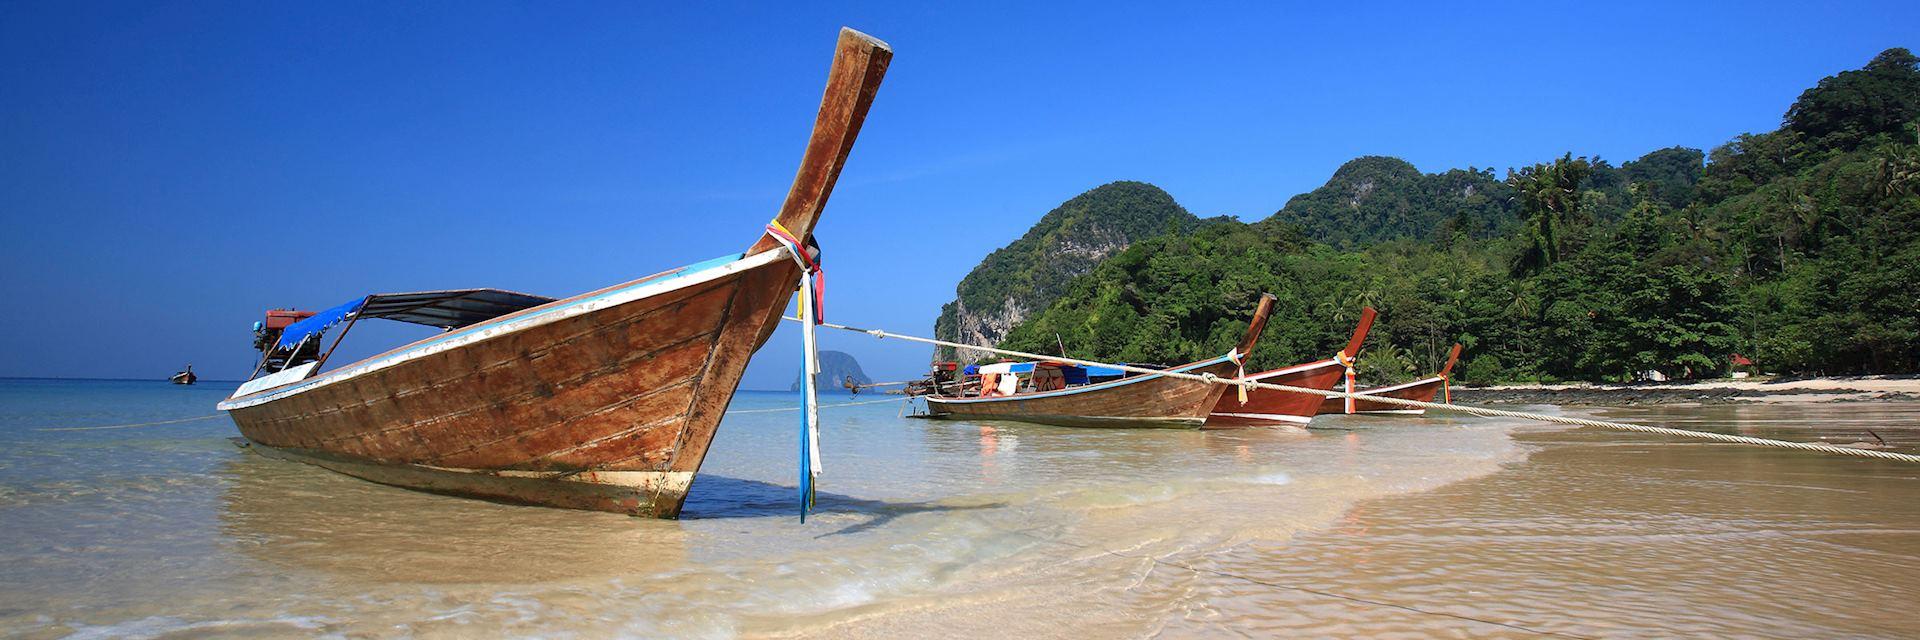 Long tail boat, Ko Lanta